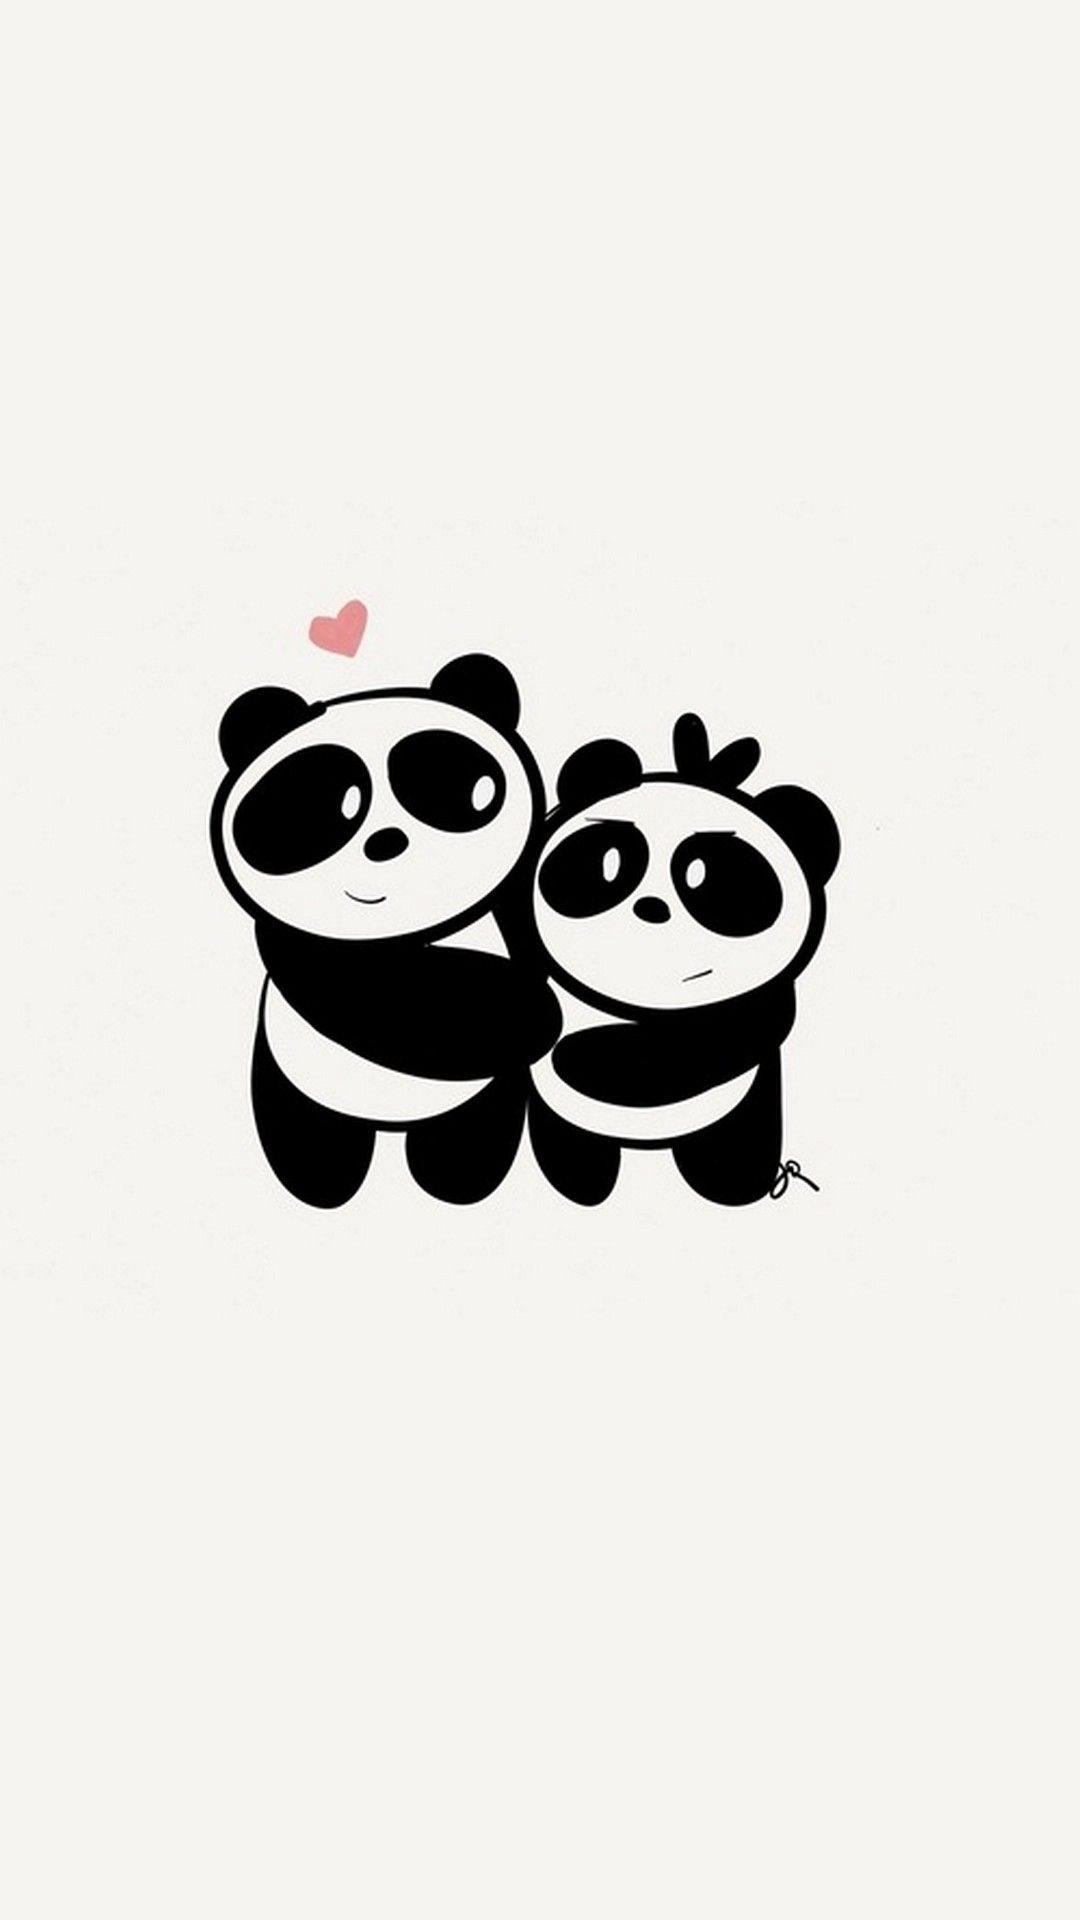 Res: 1080x1920, sweet 2 wallpapers Elegant iPhone X Cute Couple Panda Wallpaper 2018 iPhone  Wallpapers